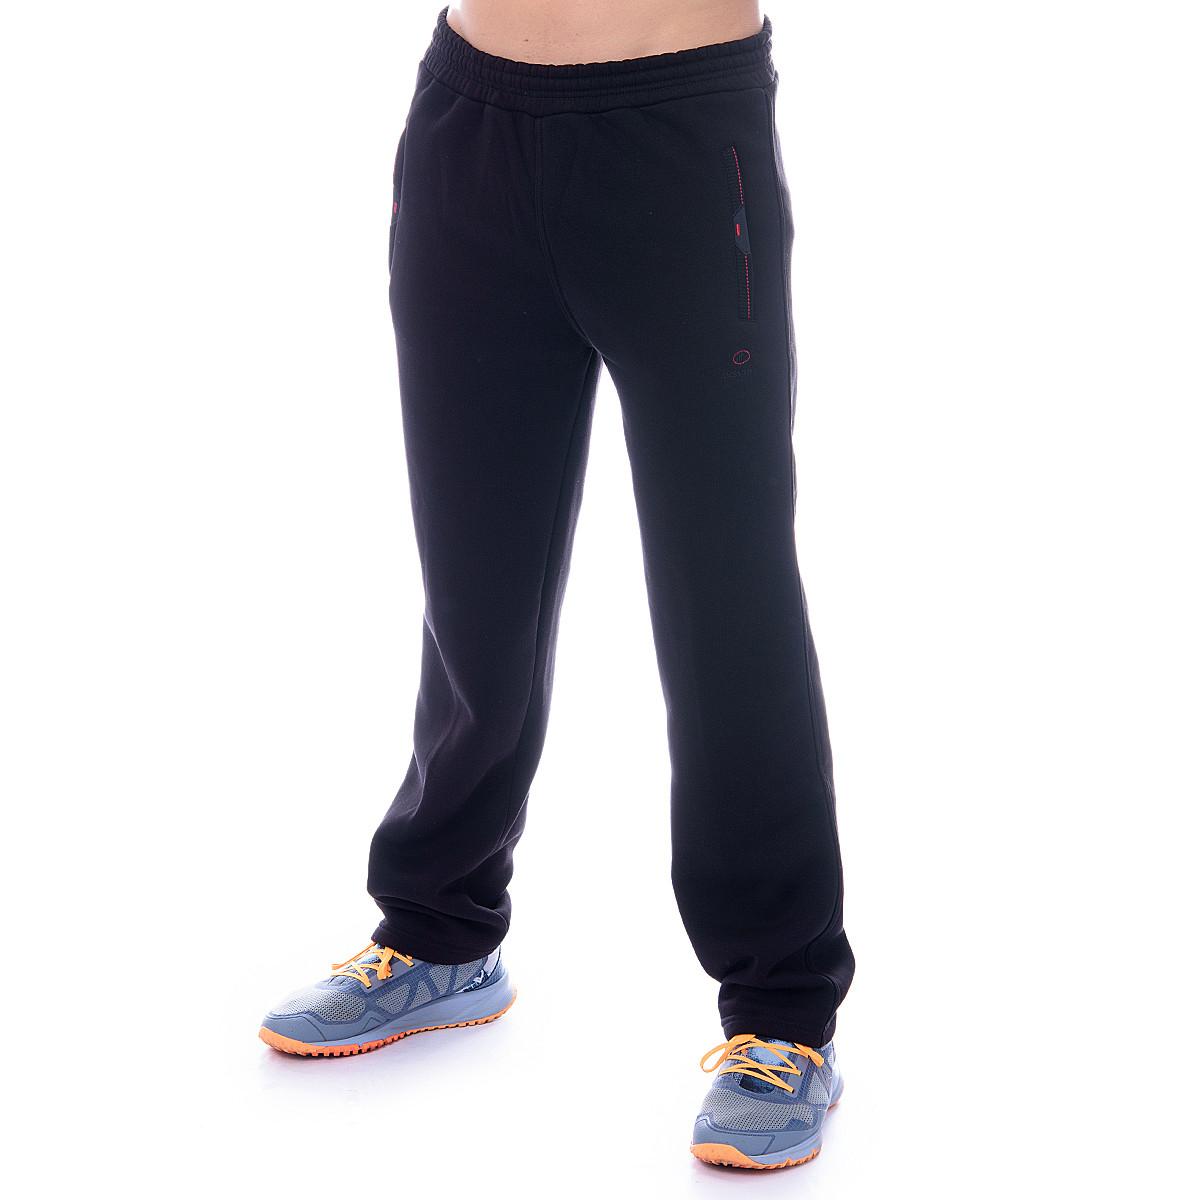 Теплые мужские брюки трехнитка с начесом пр-во Турция KD1147